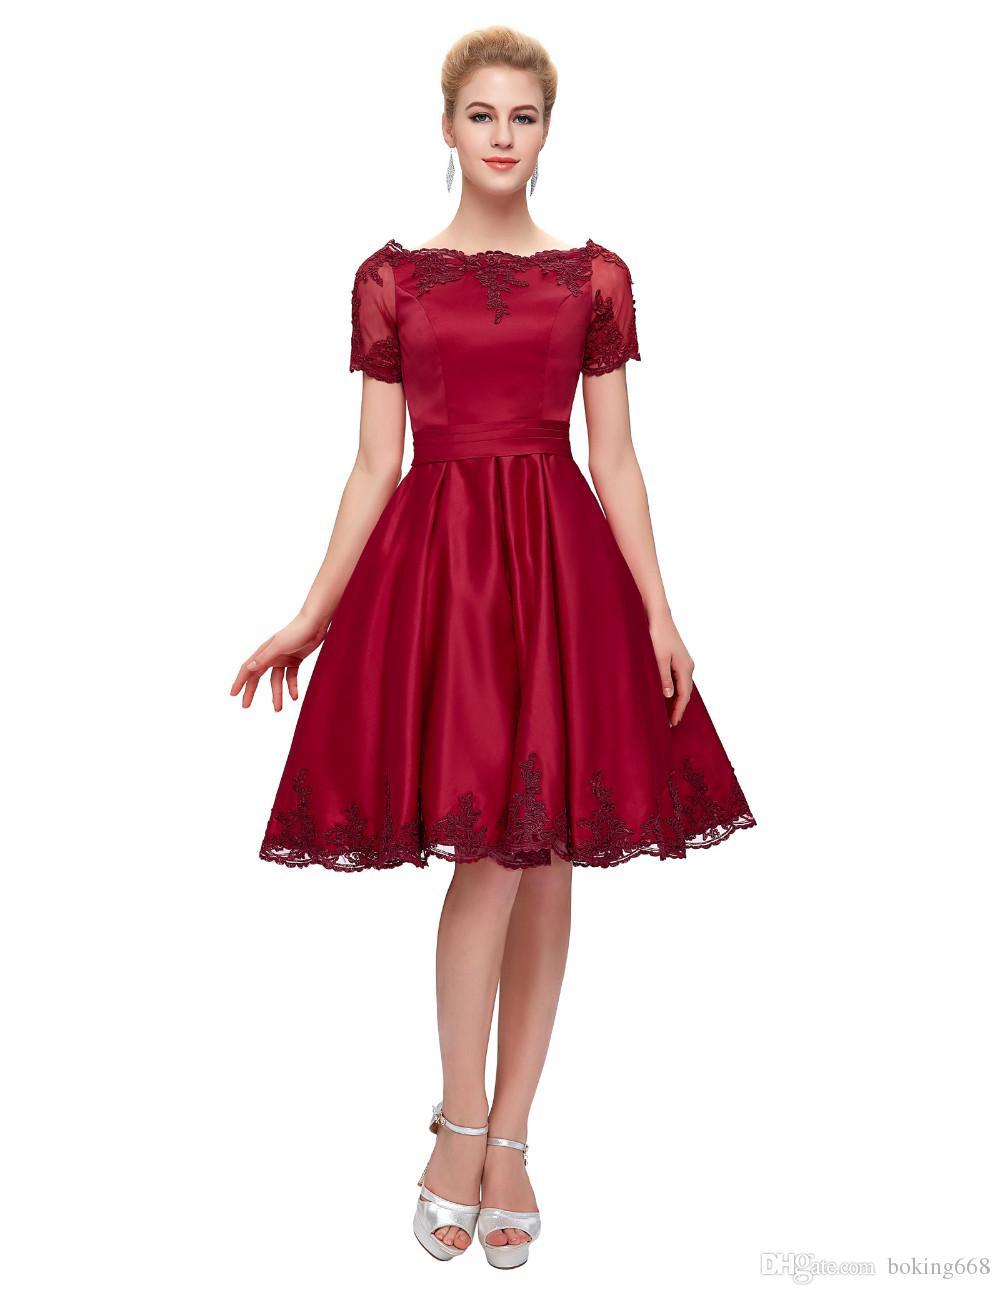 Red Short Cocktail Dresses 2016 Burgundy Short Sleeve Special ...